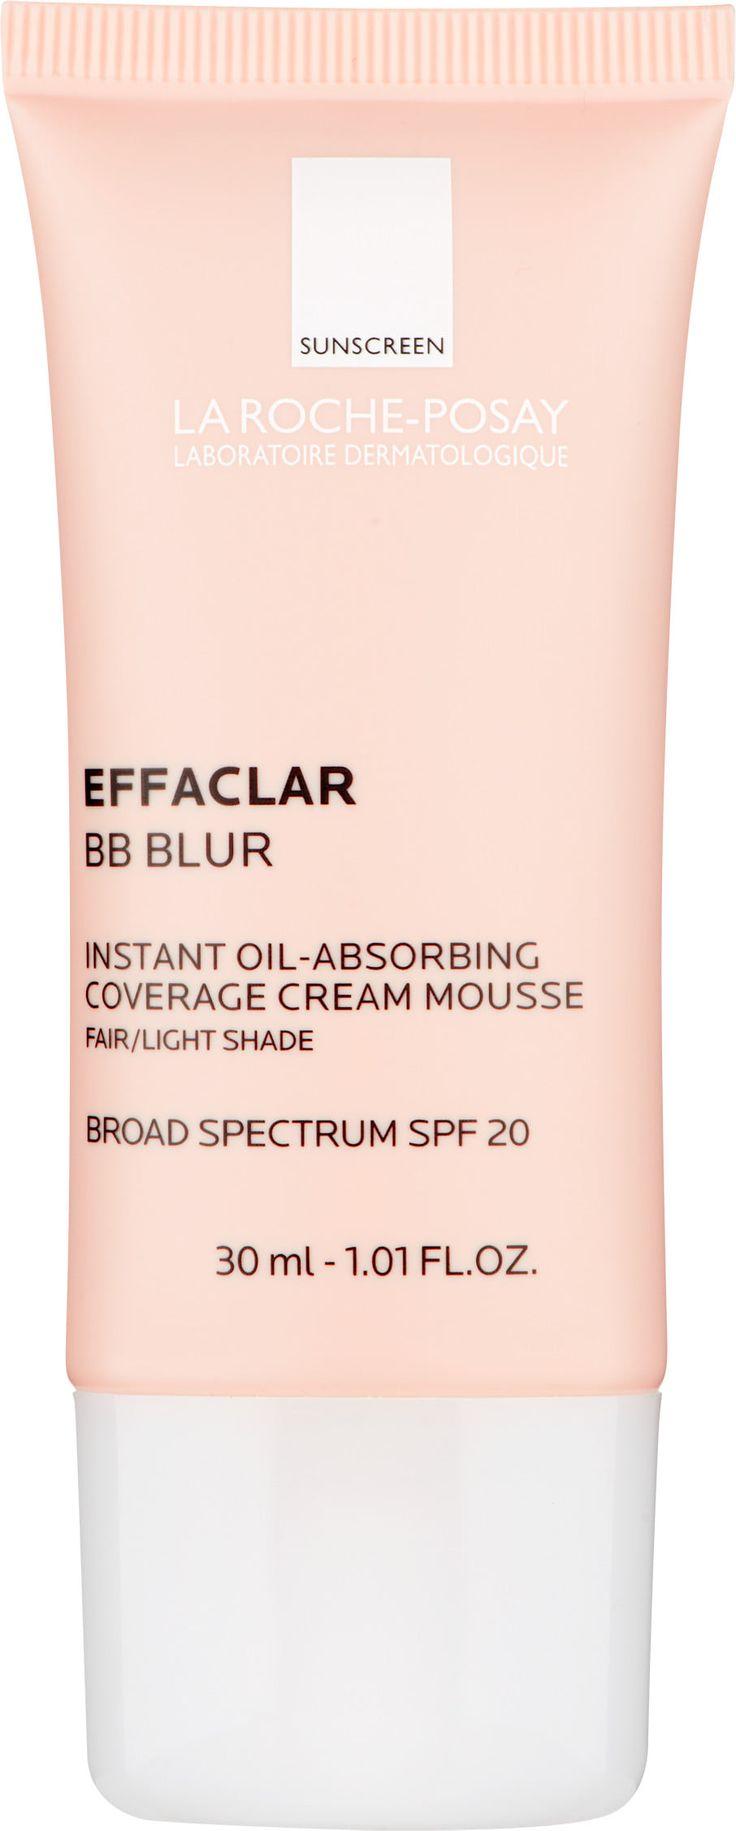 La Roche-Posay Effaclar BB Blur - Instant Oil-Absorbing Coverage Cream Mousse 30ml Fair/Light